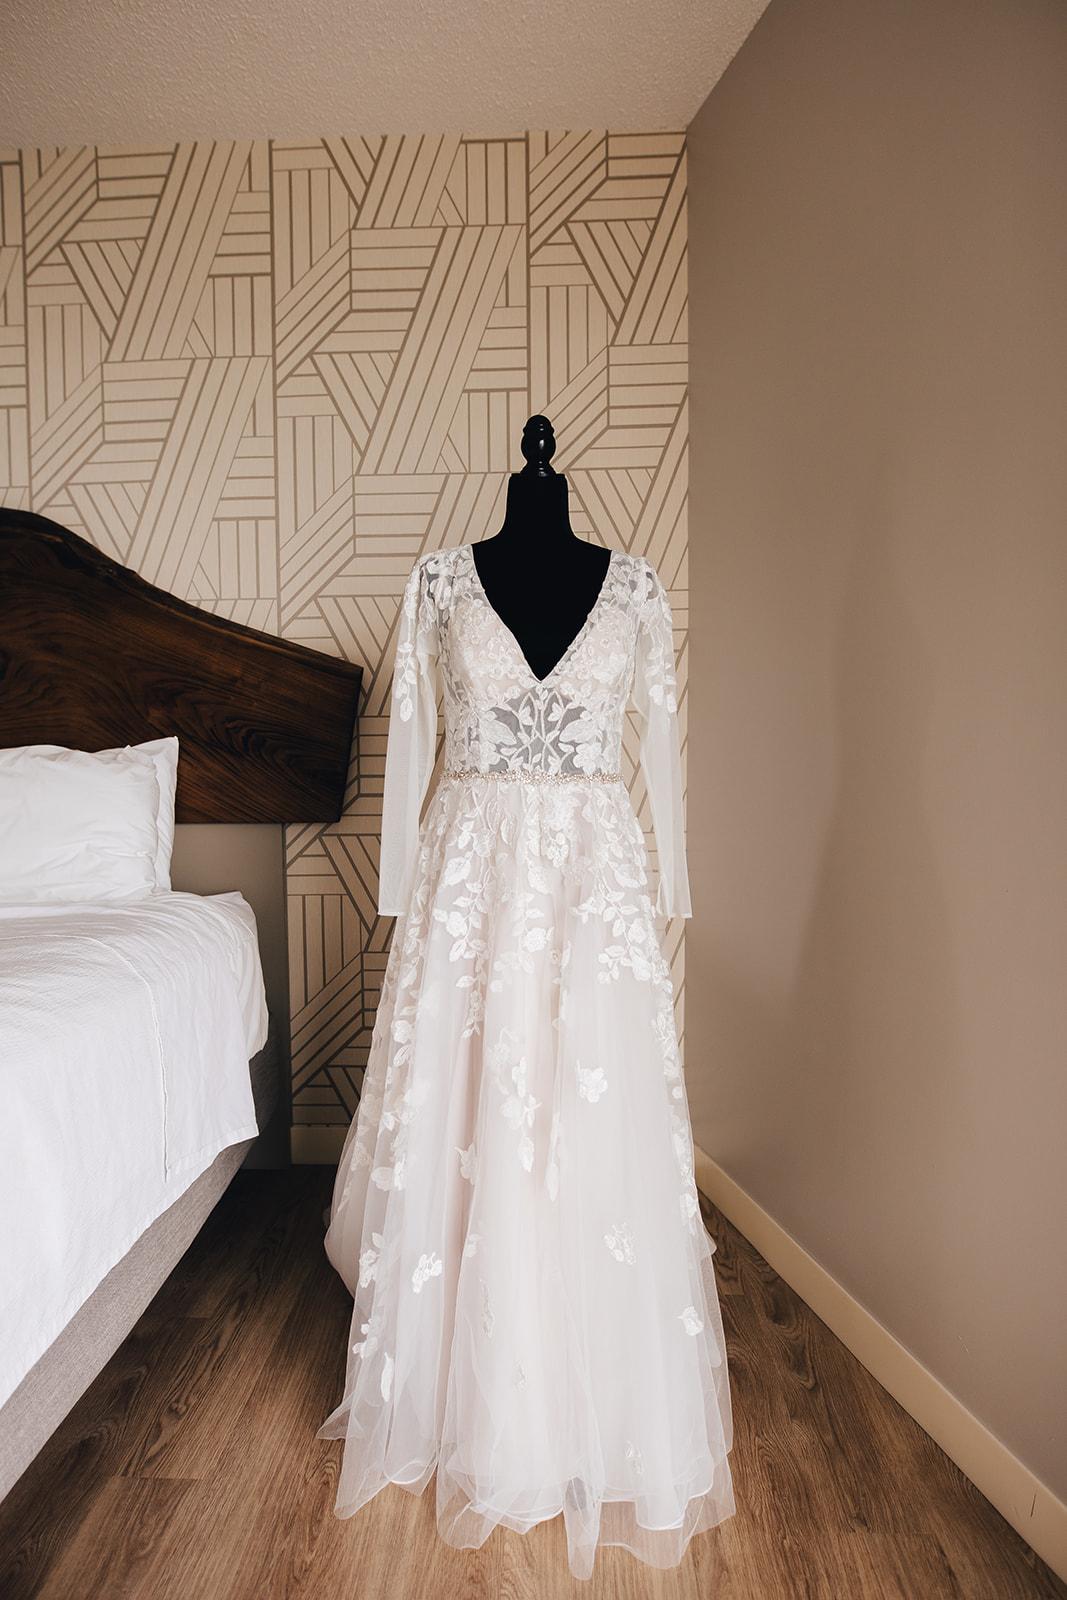 Brides gown on mannequin